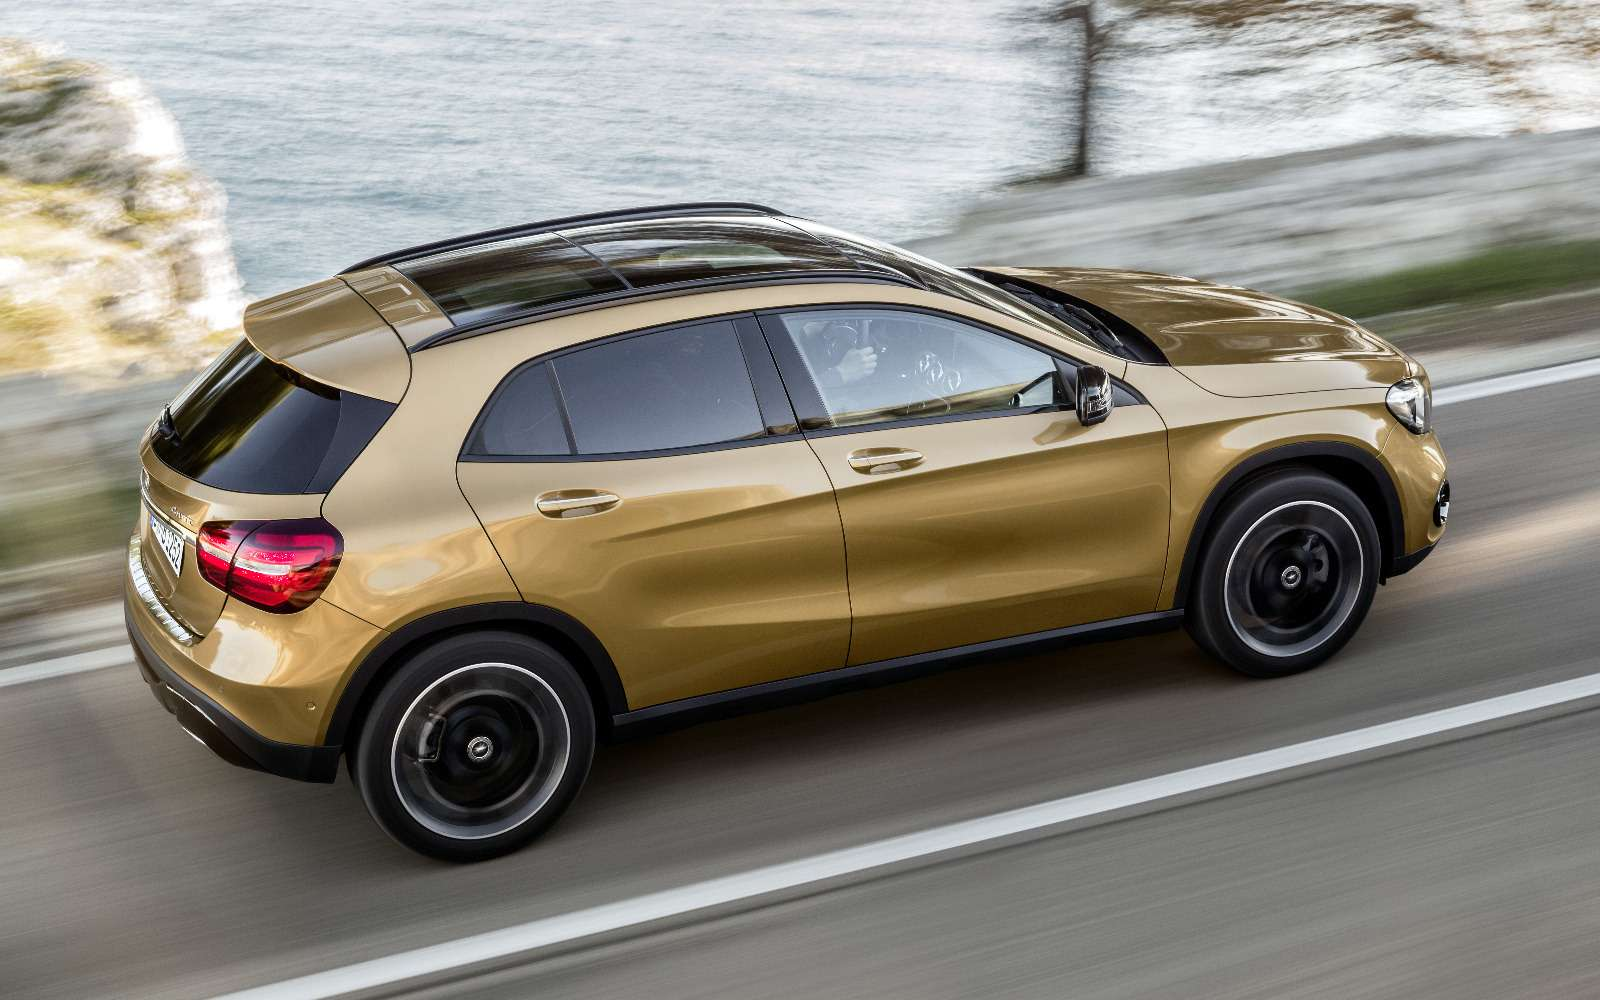 Mercedes-Benz GLA стал краше, ноне просторнее— фото 690067